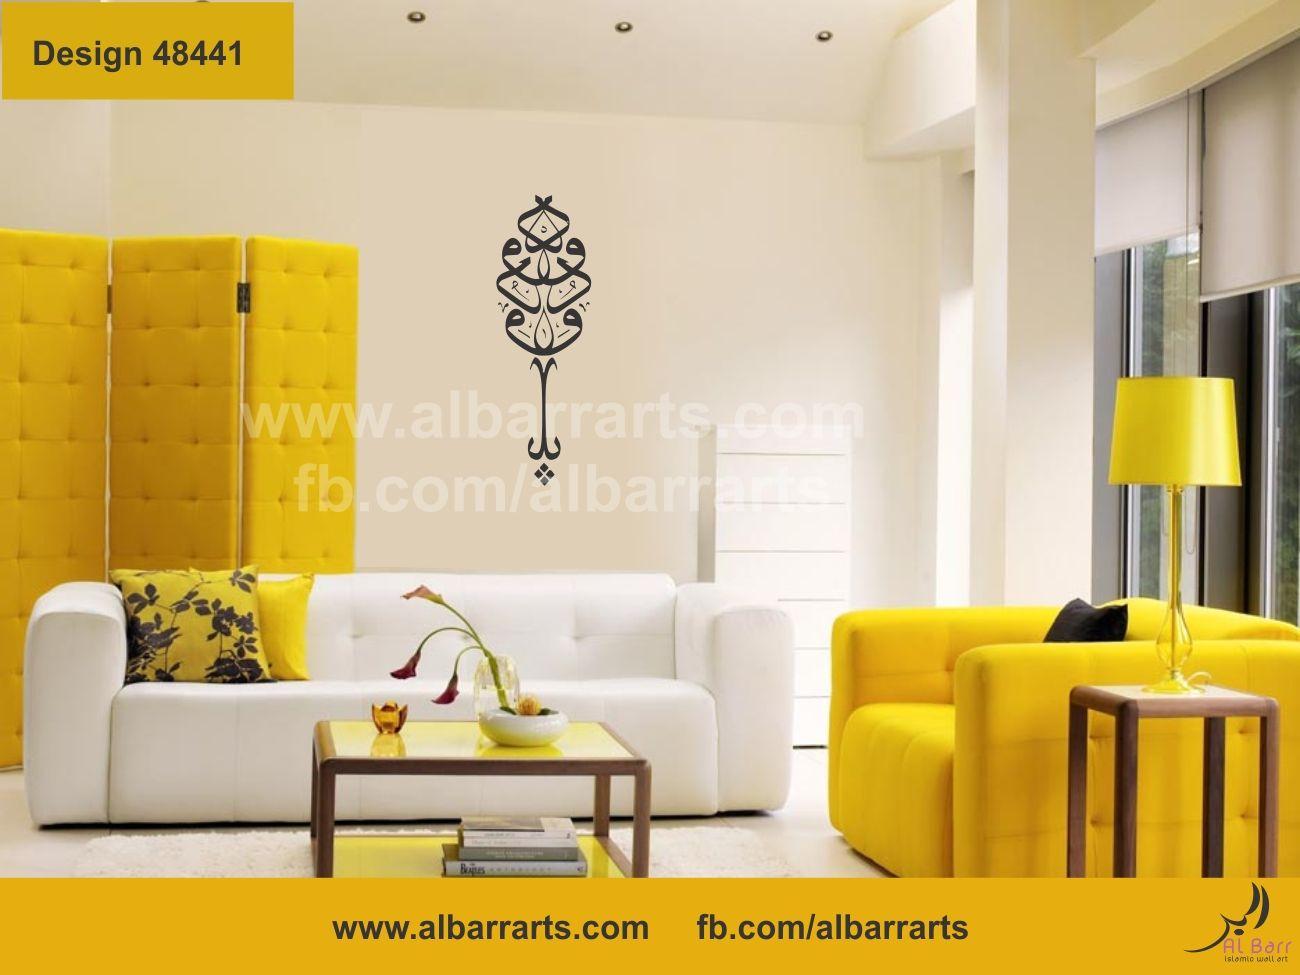 Living room furniture names - Very Beautiful Name Of Allah Wadood Islamic Wall Art Names Of Living Room Furniture